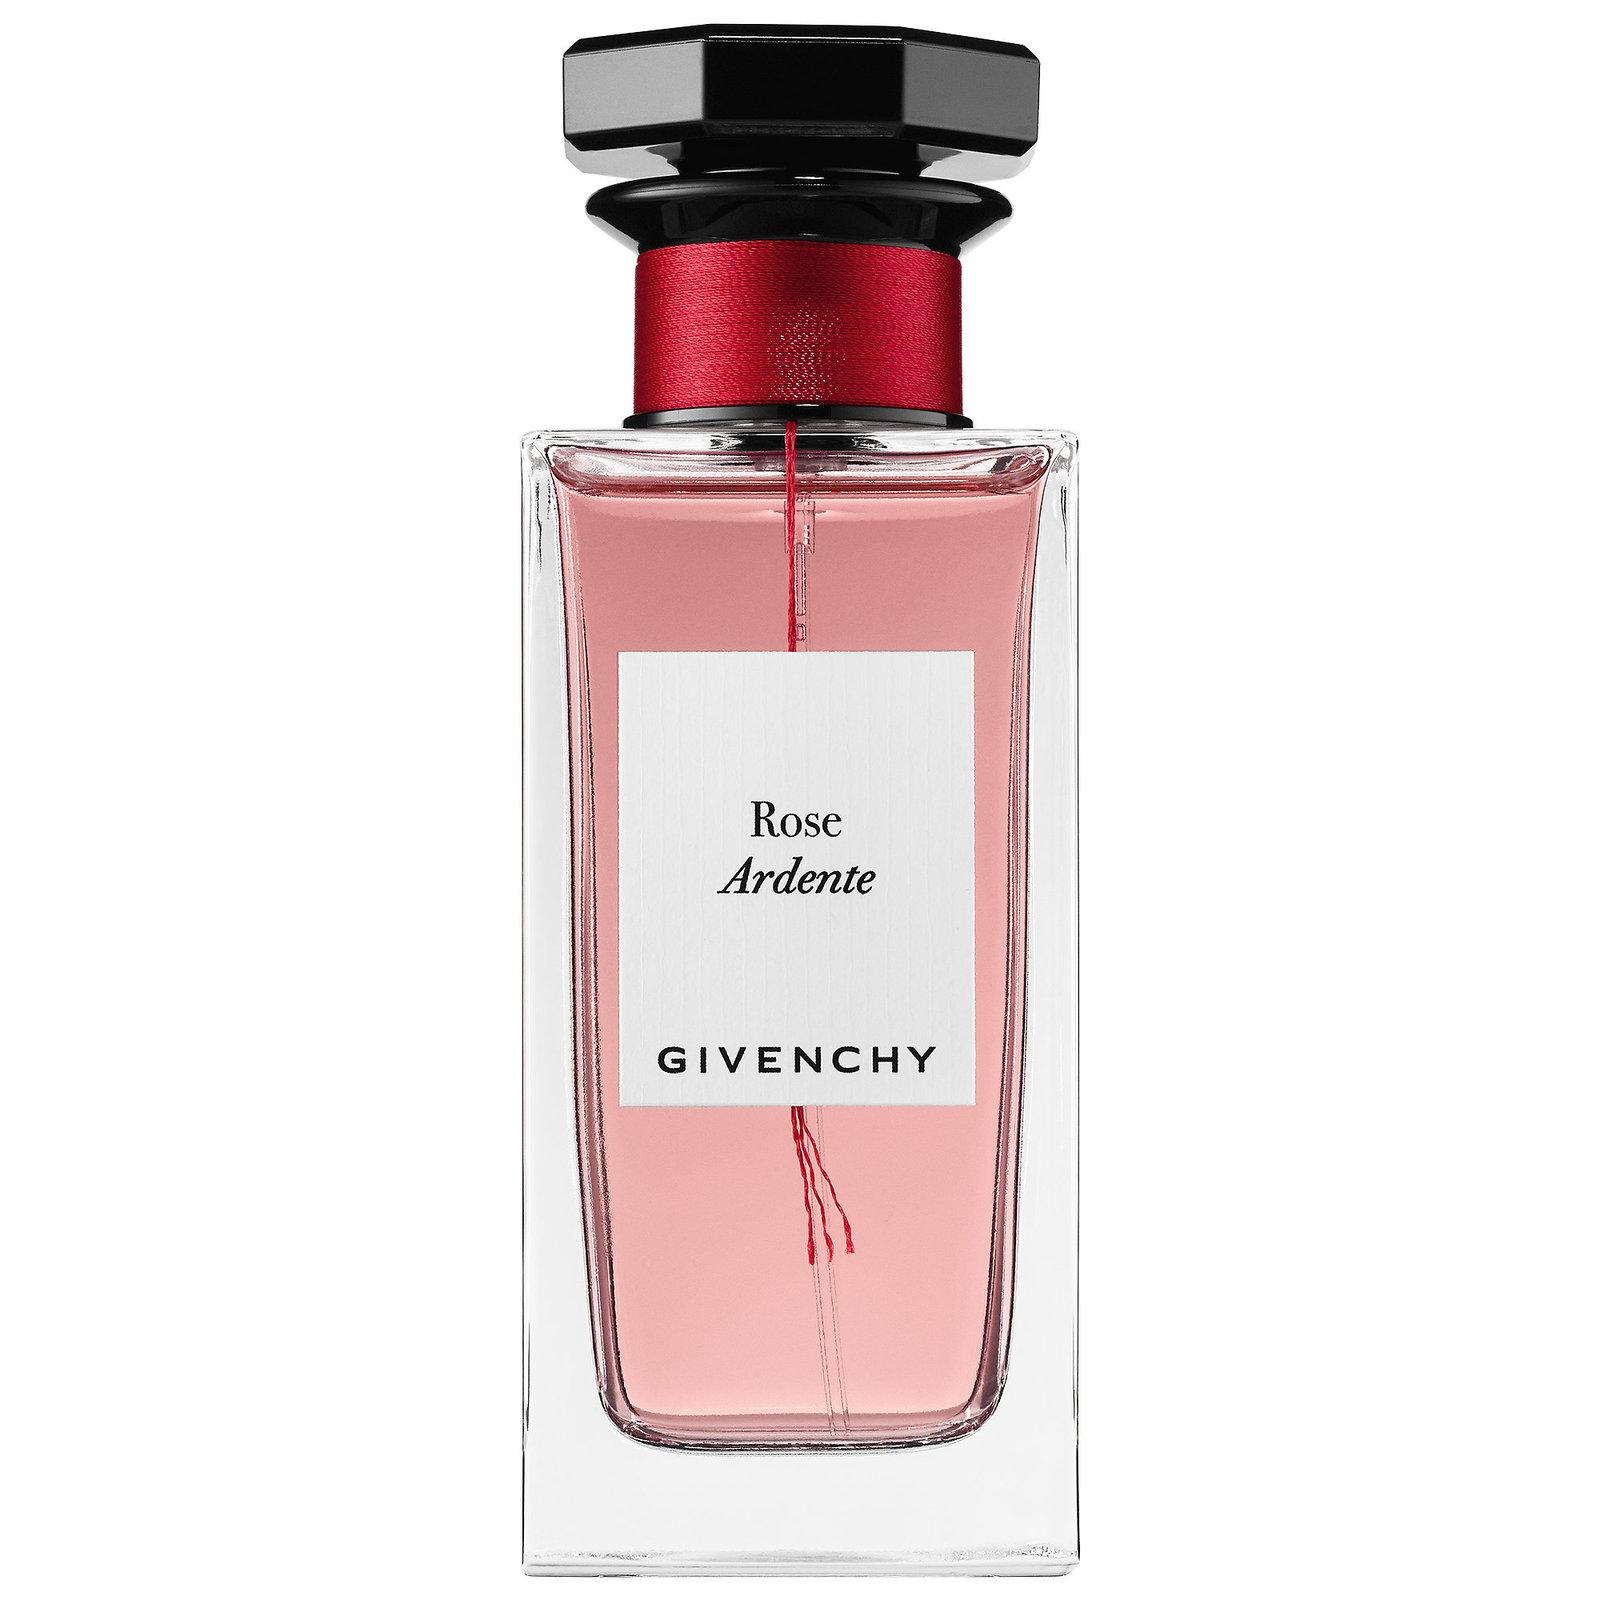 ROSE ARDENTE by GIVENCHY 5ml Travel Spray Perfume HONEY AMBER